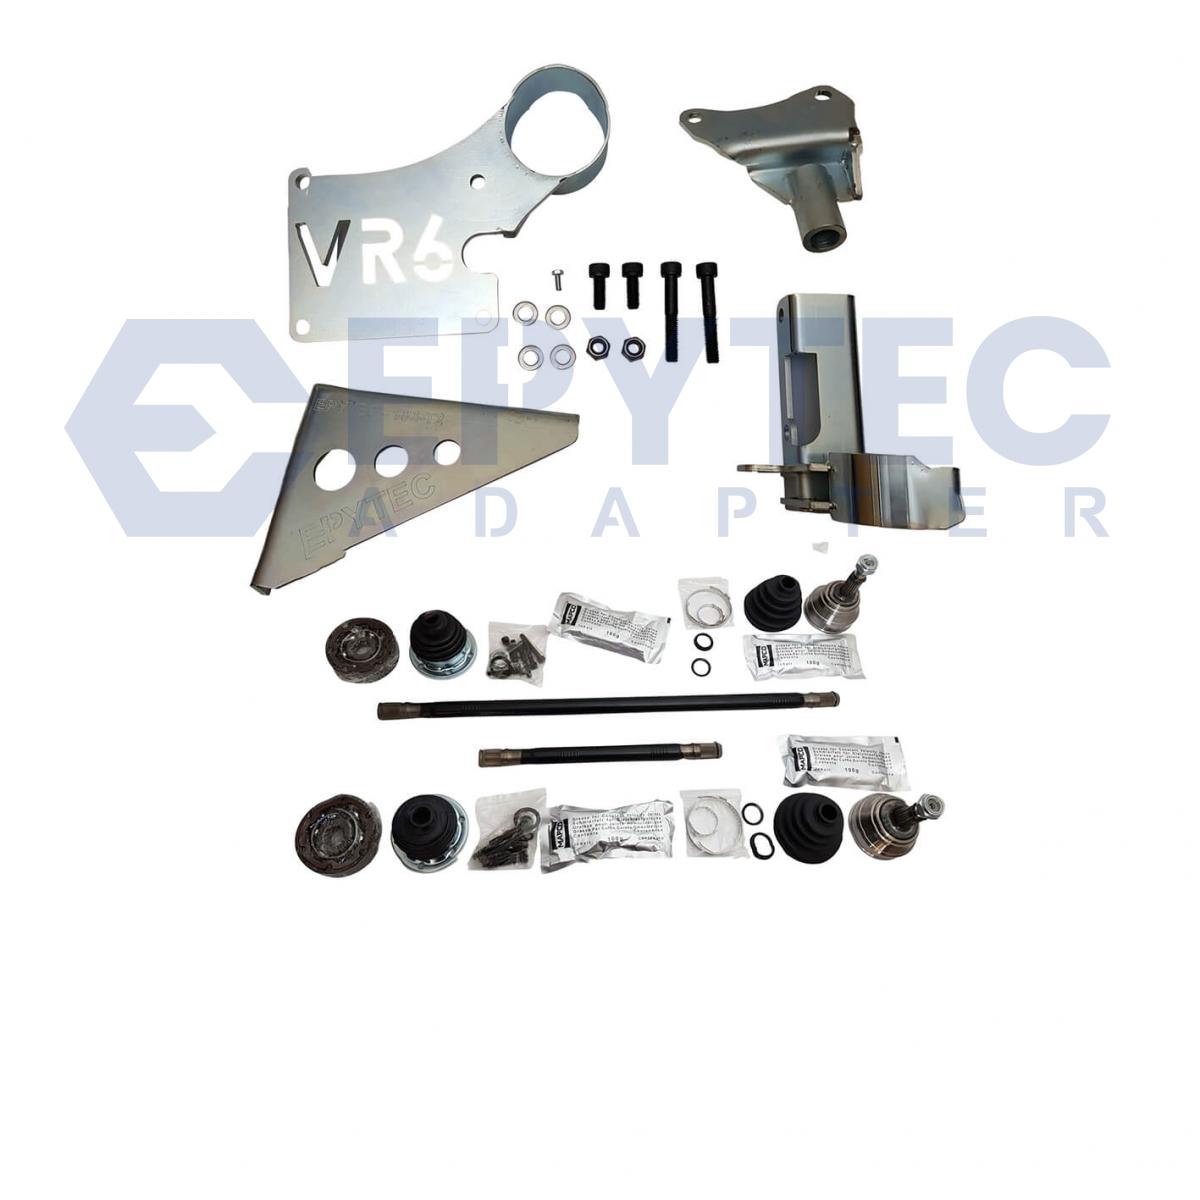 MK1 Golf VR6, 2 8 & 2 9 Engine Mounting Kit 5Sp 02A 02J with Driveshafts